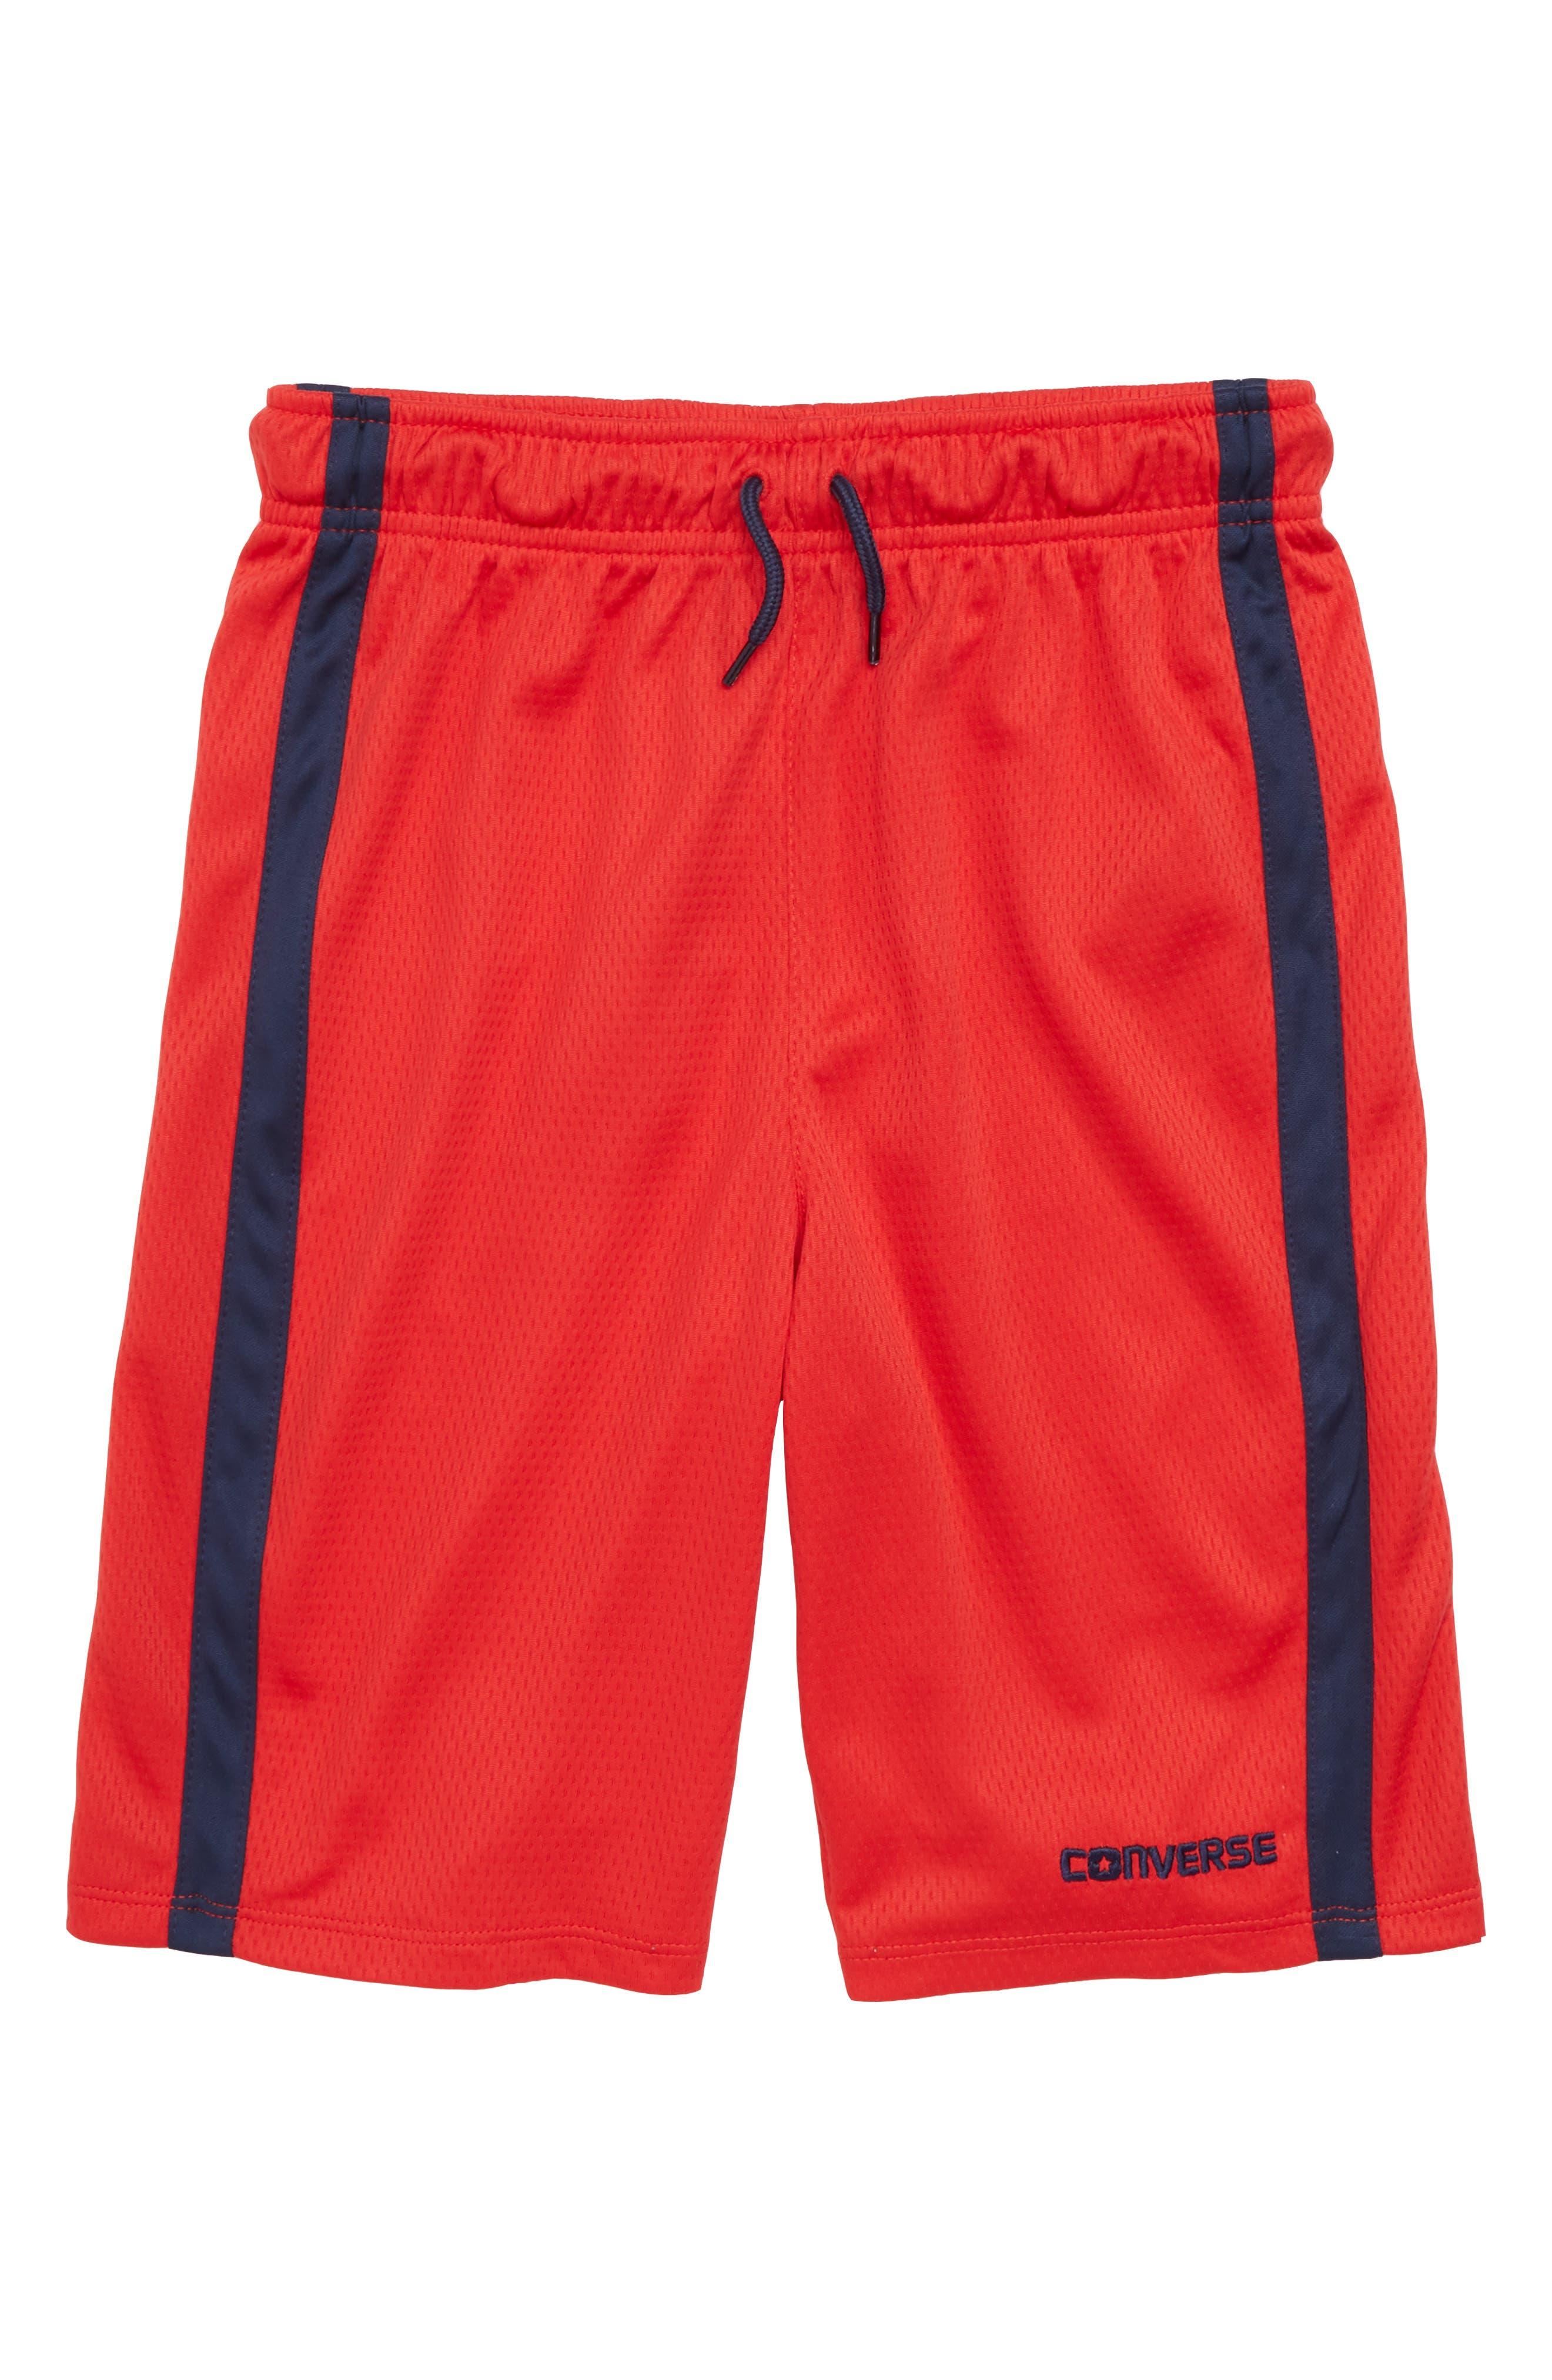 Stripe Mesh Shorts,                             Main thumbnail 1, color,                             Converse Red